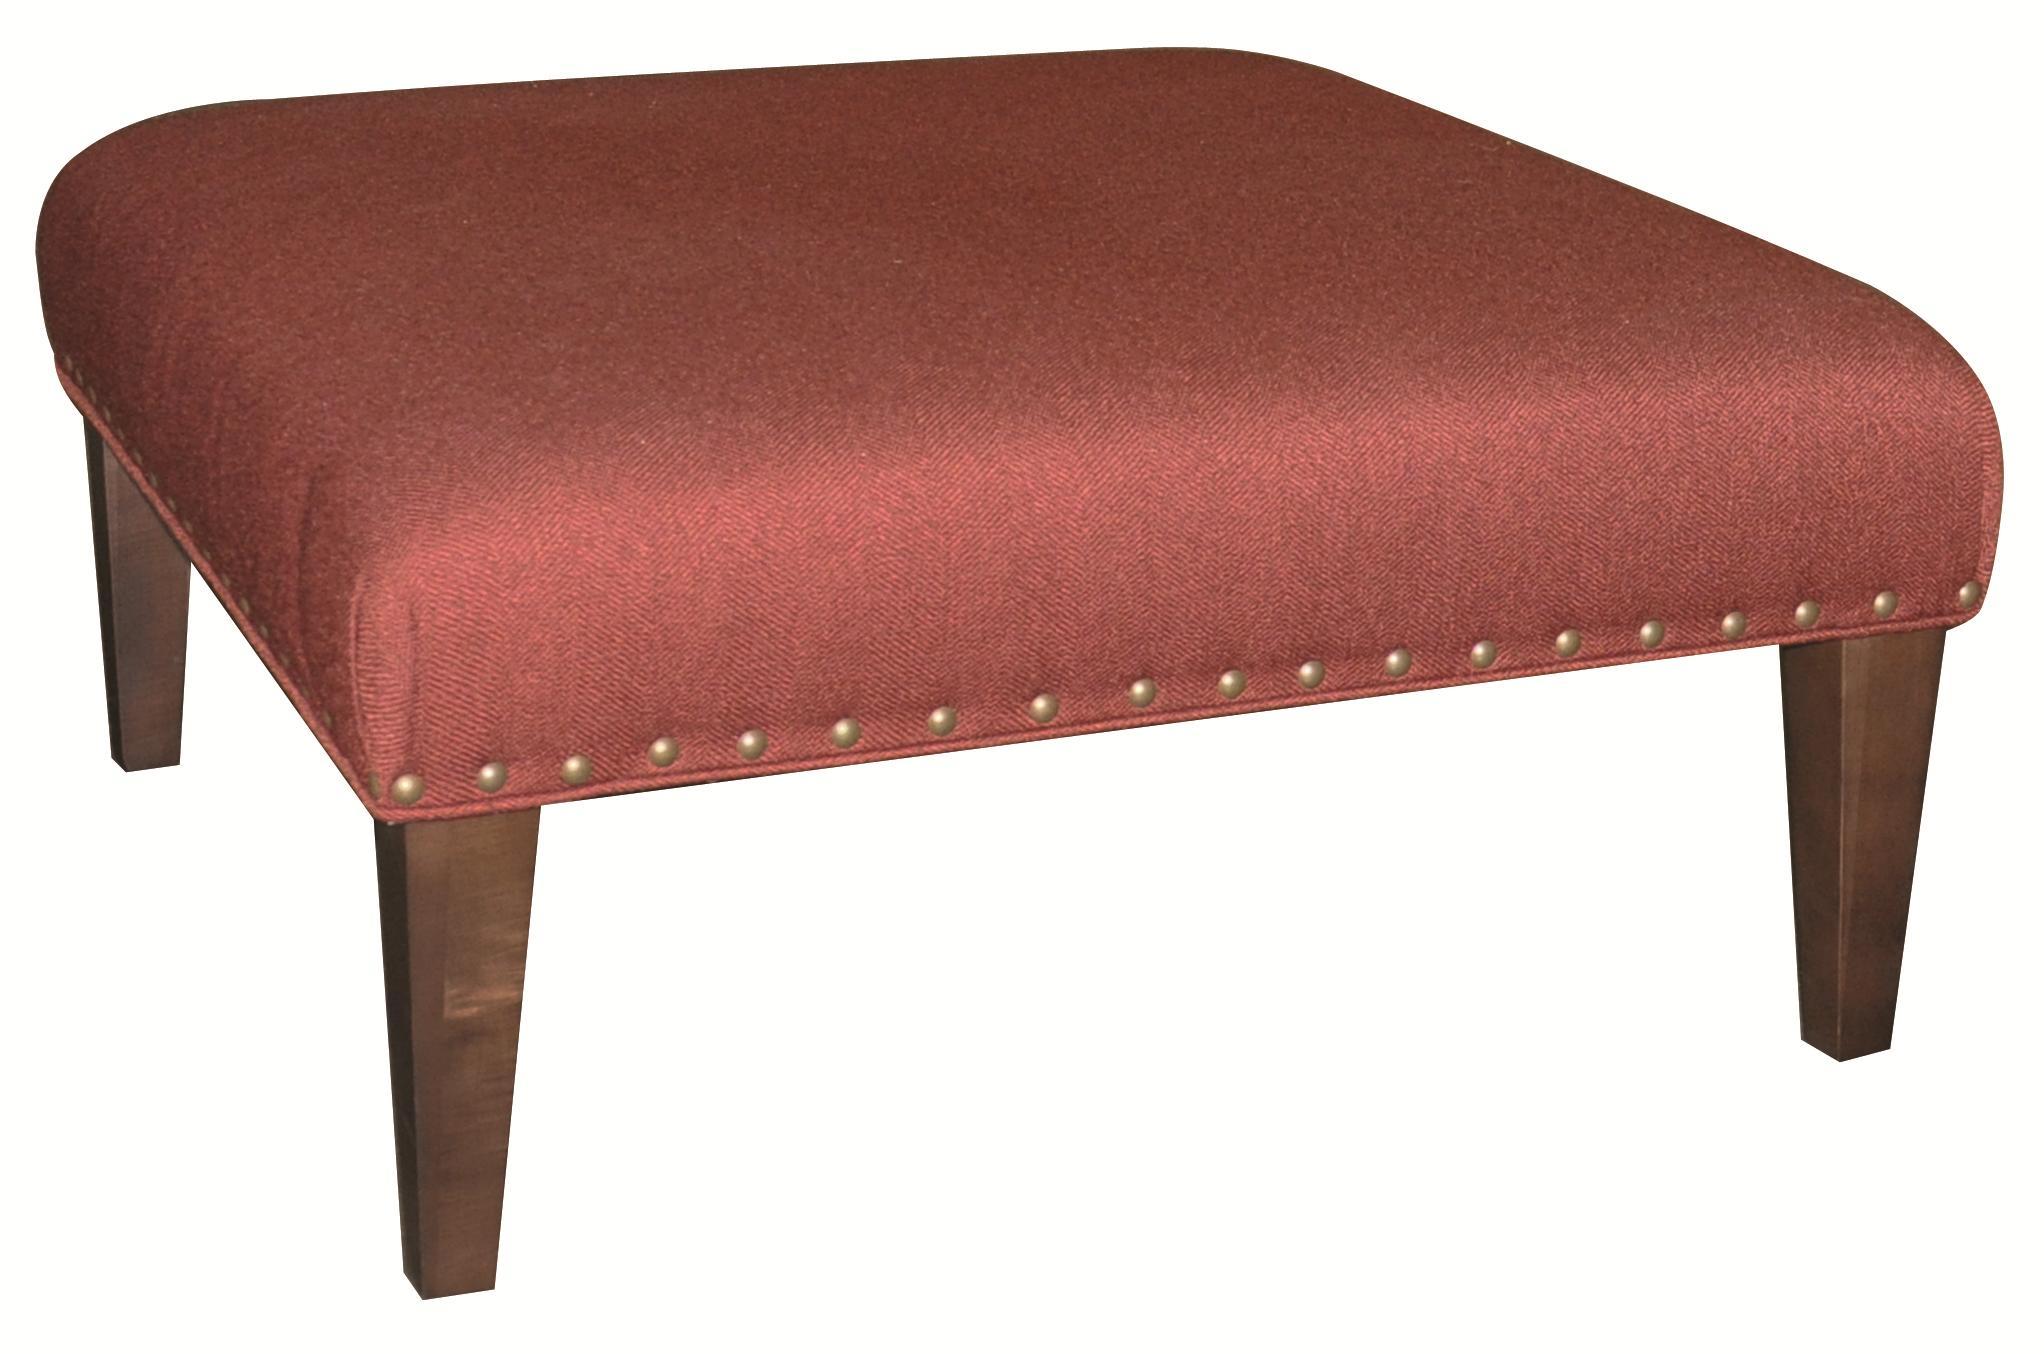 Morris Home Furnishings Cecelia Cecelia Ottoman - Item Number: 116228142